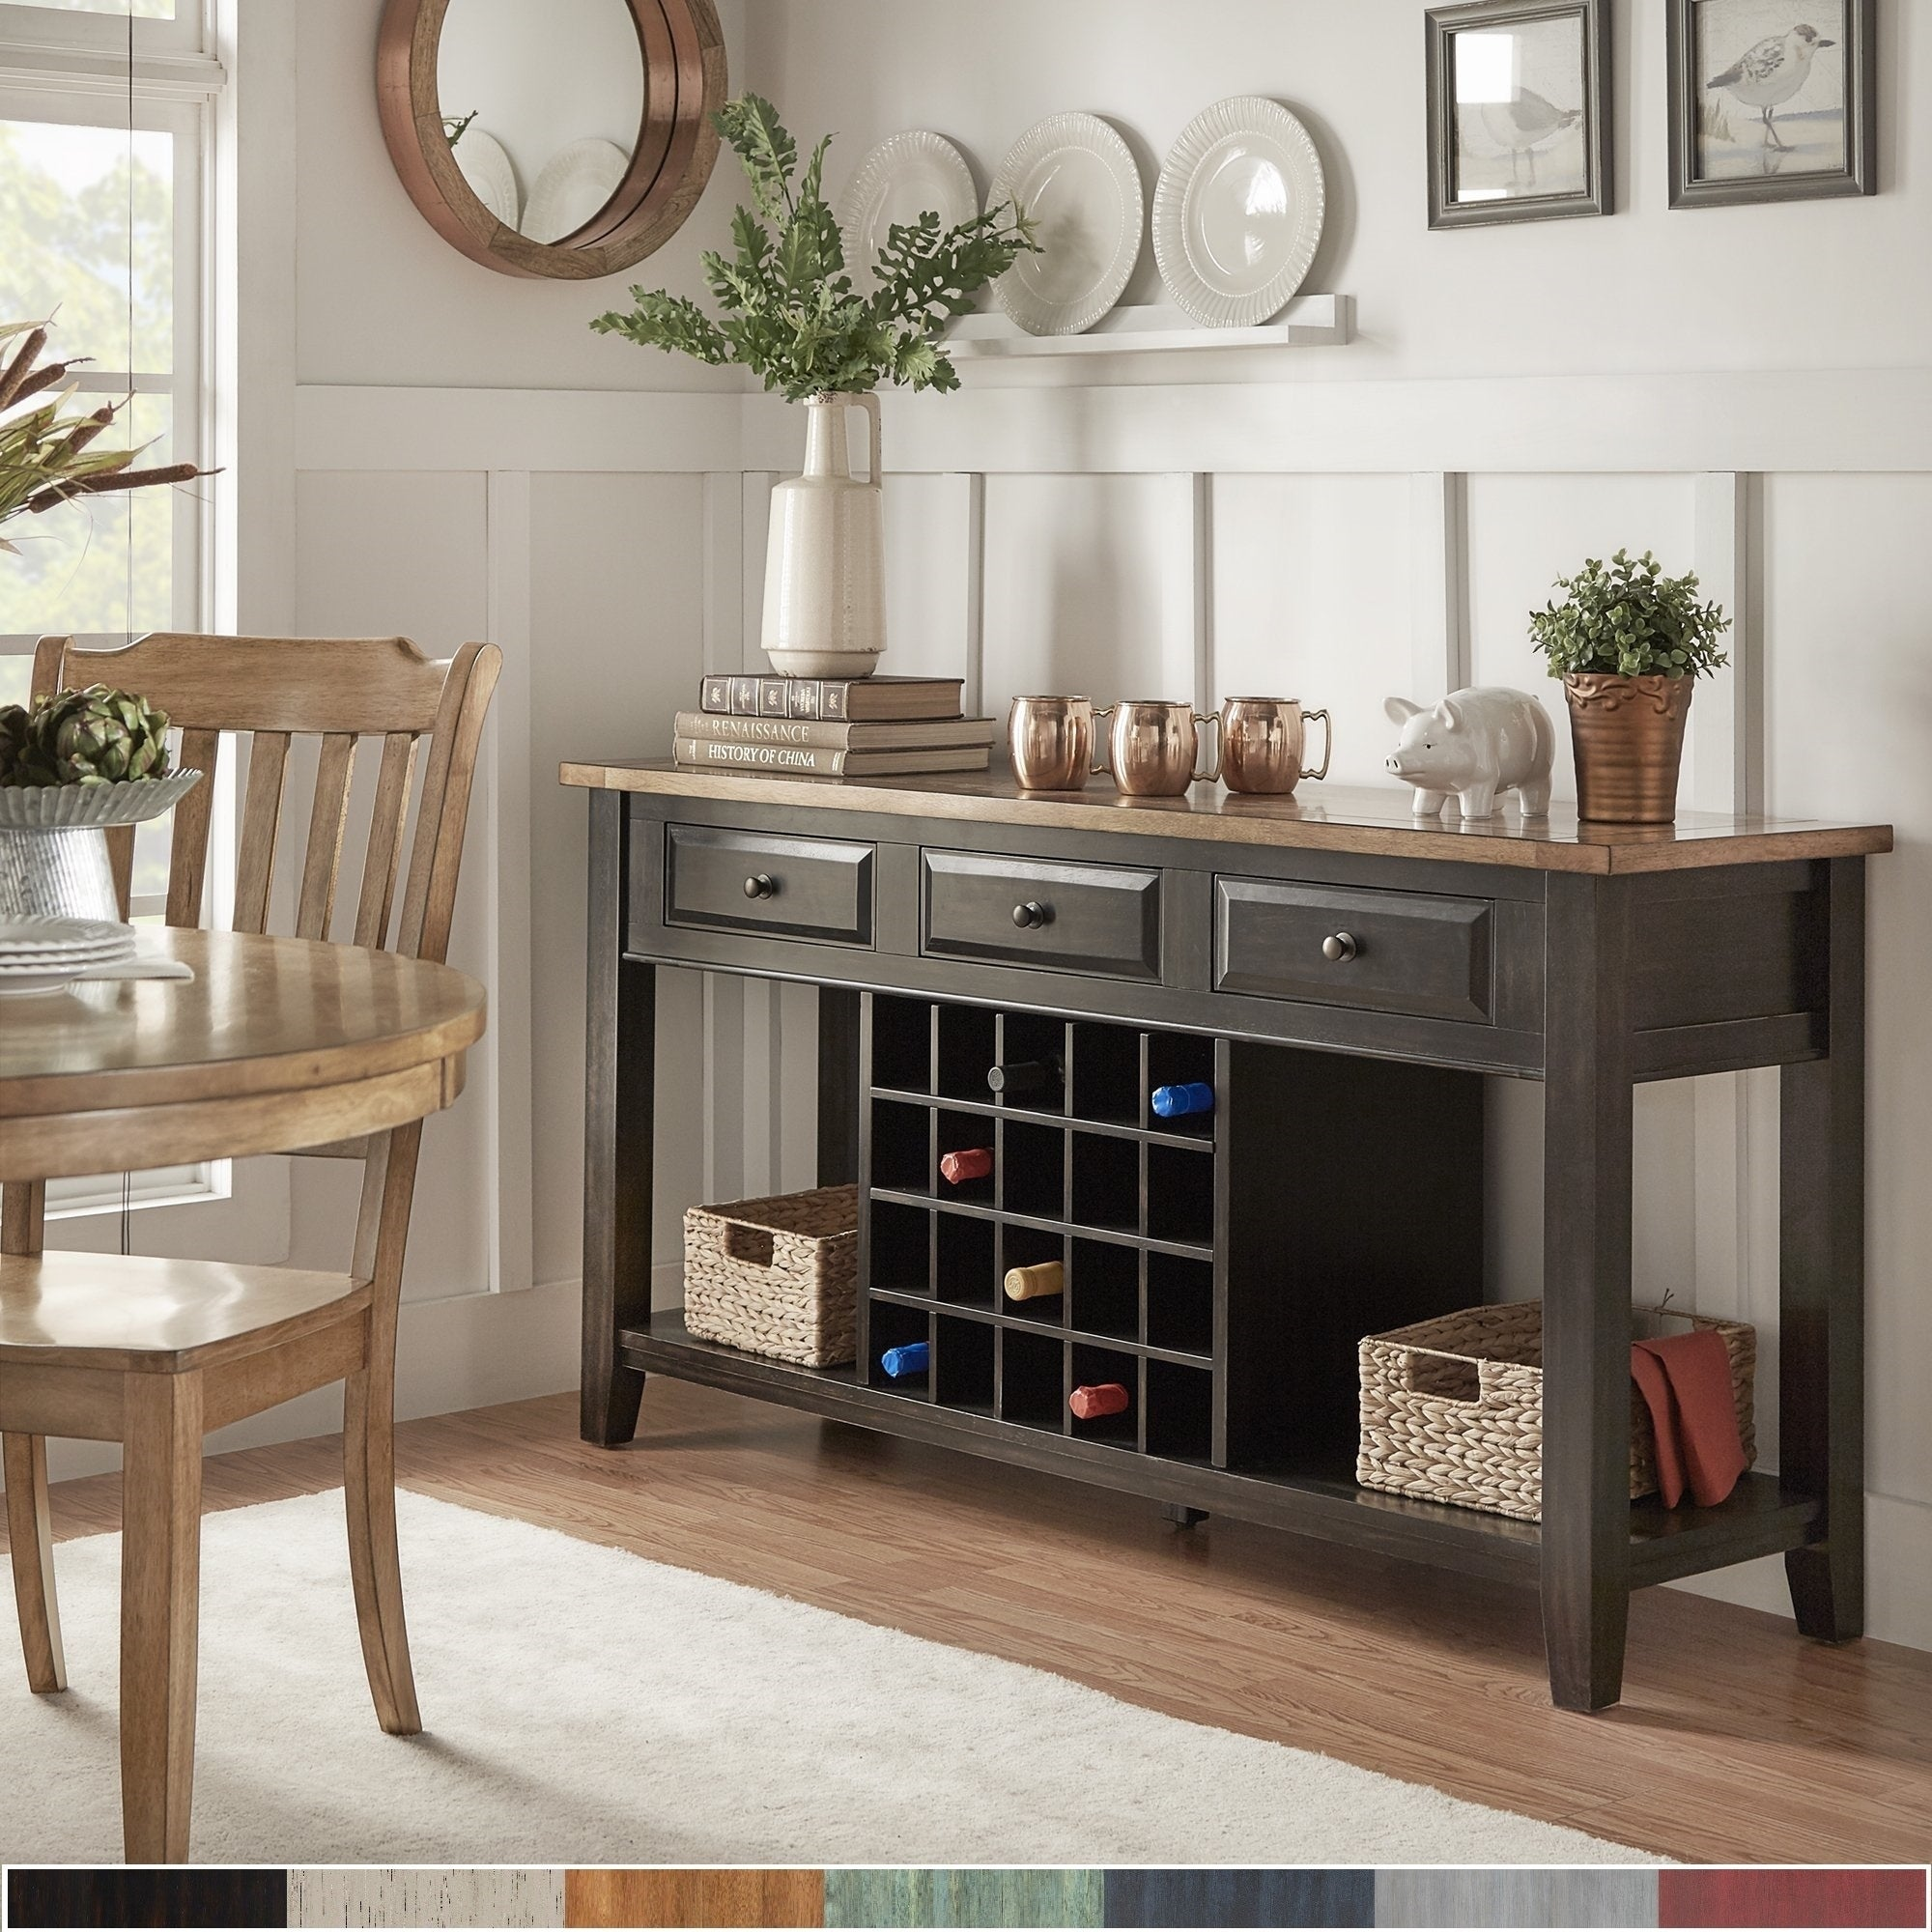 Eleanor Two Tone Wood Wine Rack Buffet Server By INSPIRE